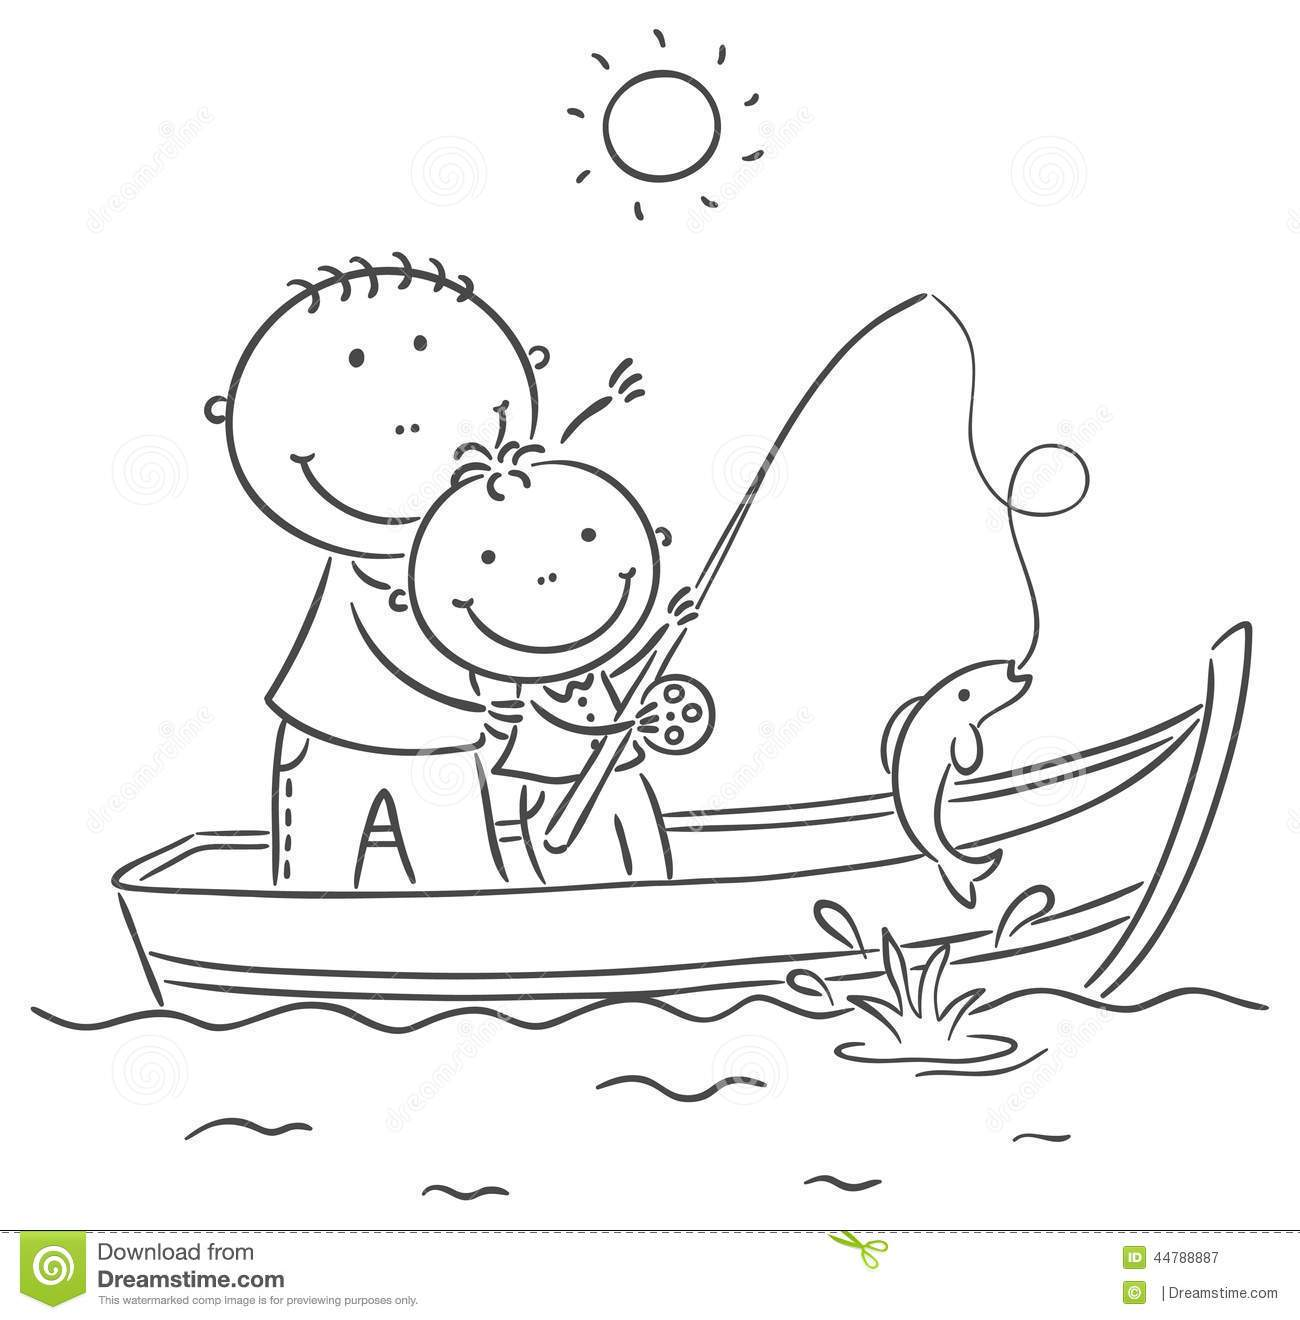 Kids fishing clipart black and white 5 » Clipart Portal.